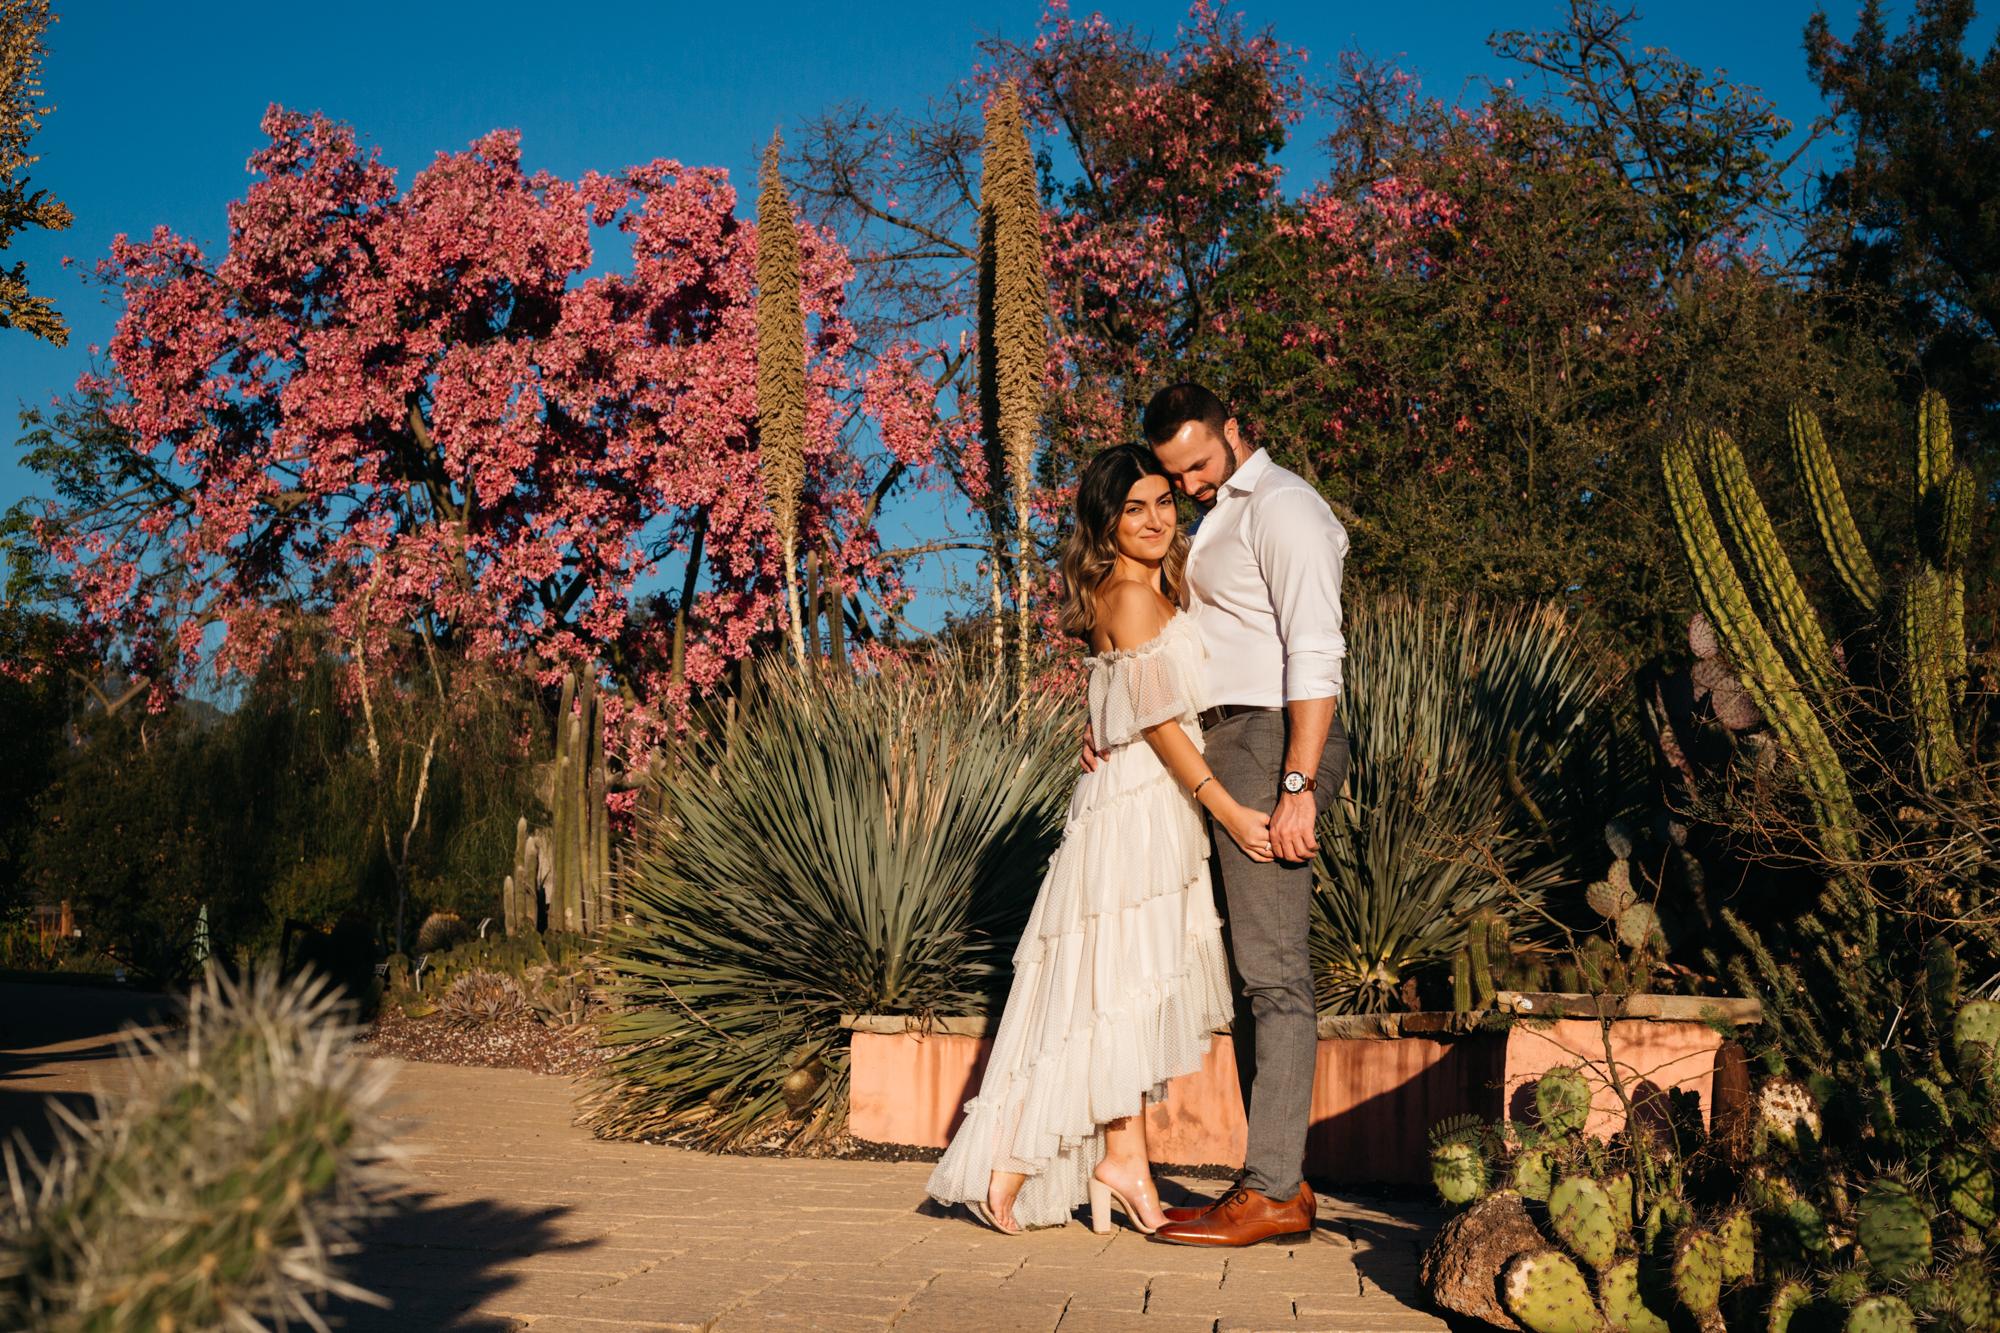 022-2018-LA-arboretum.jpg